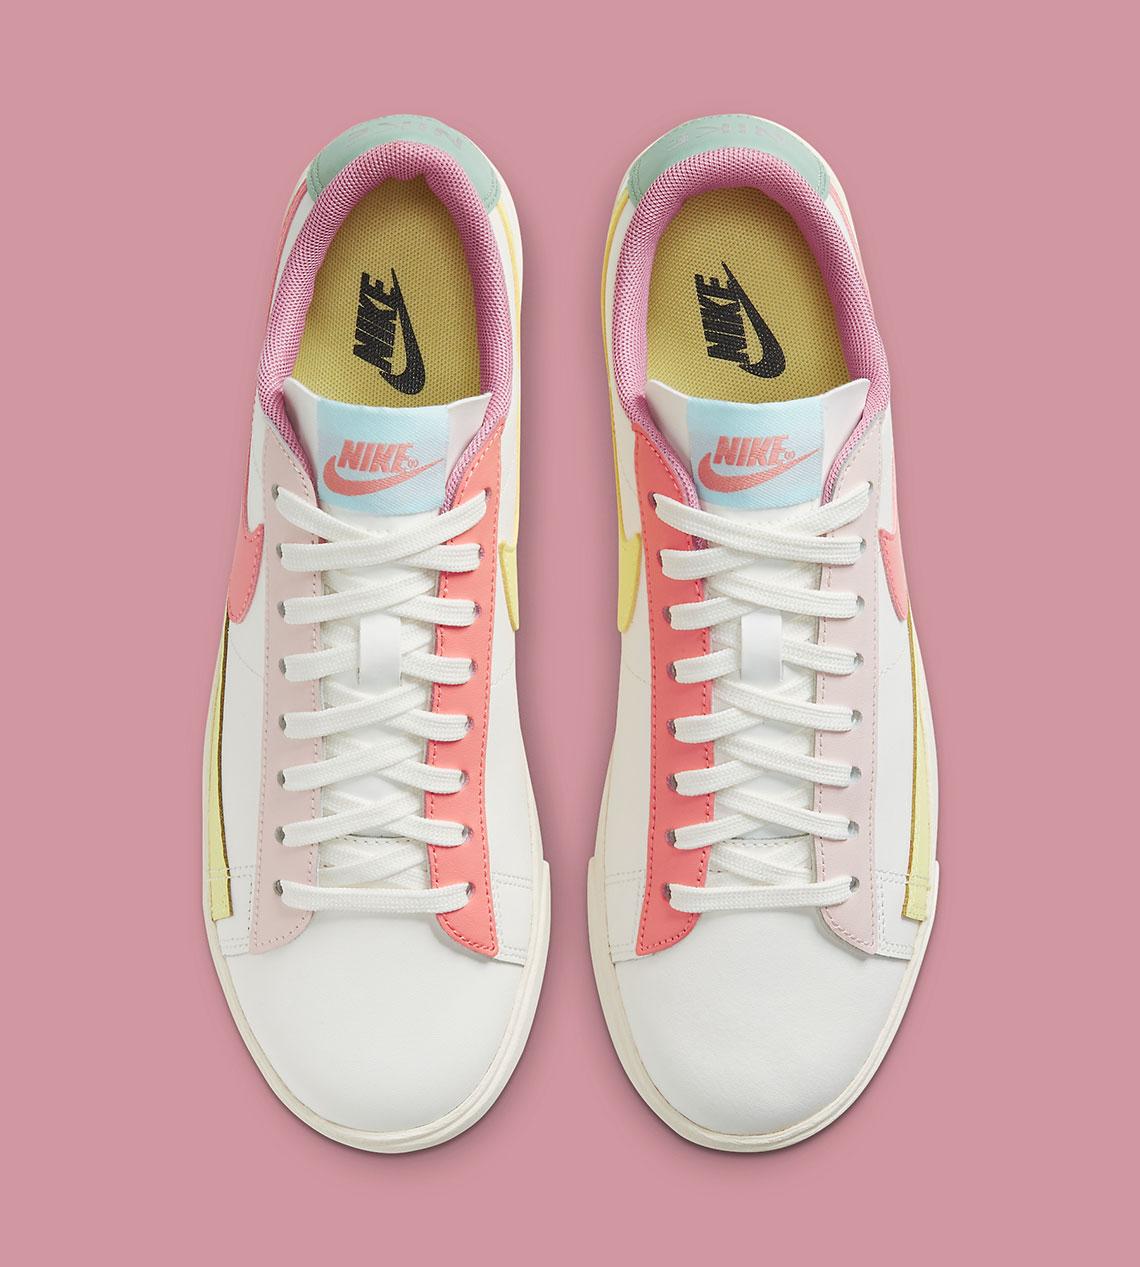 Nike Blazer Faible WMNS DJ0035-161 - Comparaland